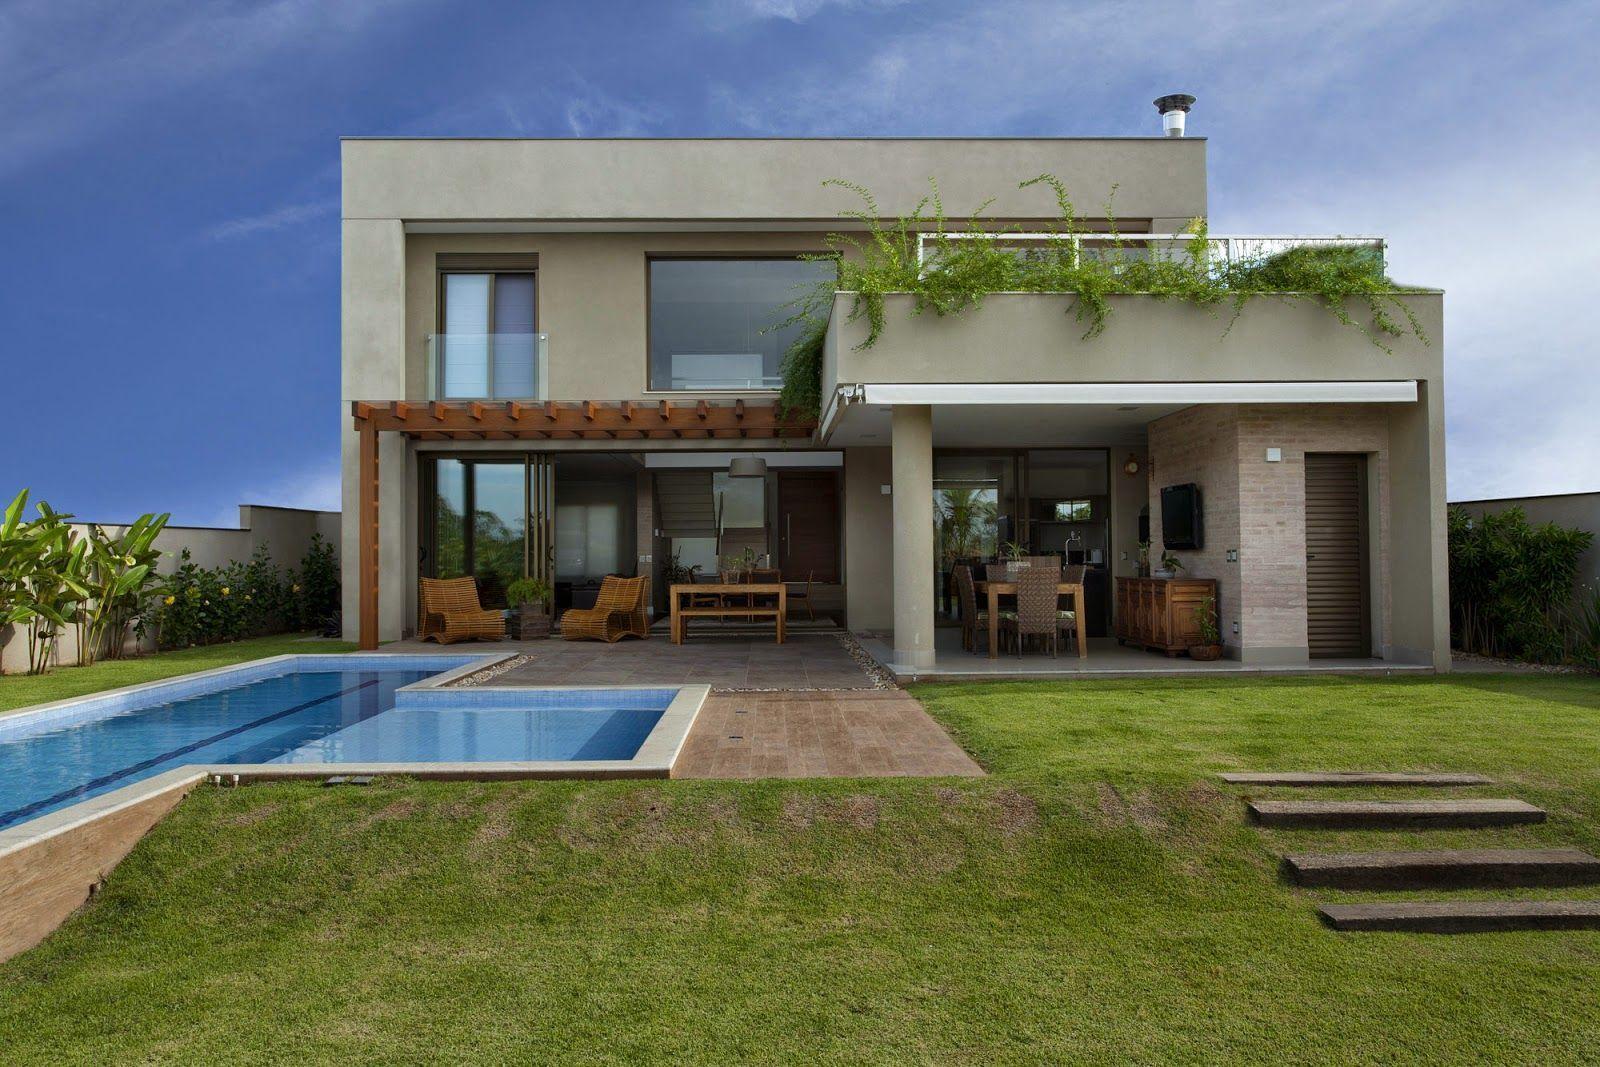 Imperd vel 110 refer ncias de casas bonitas para se inspirar for Casas bonitas interiores